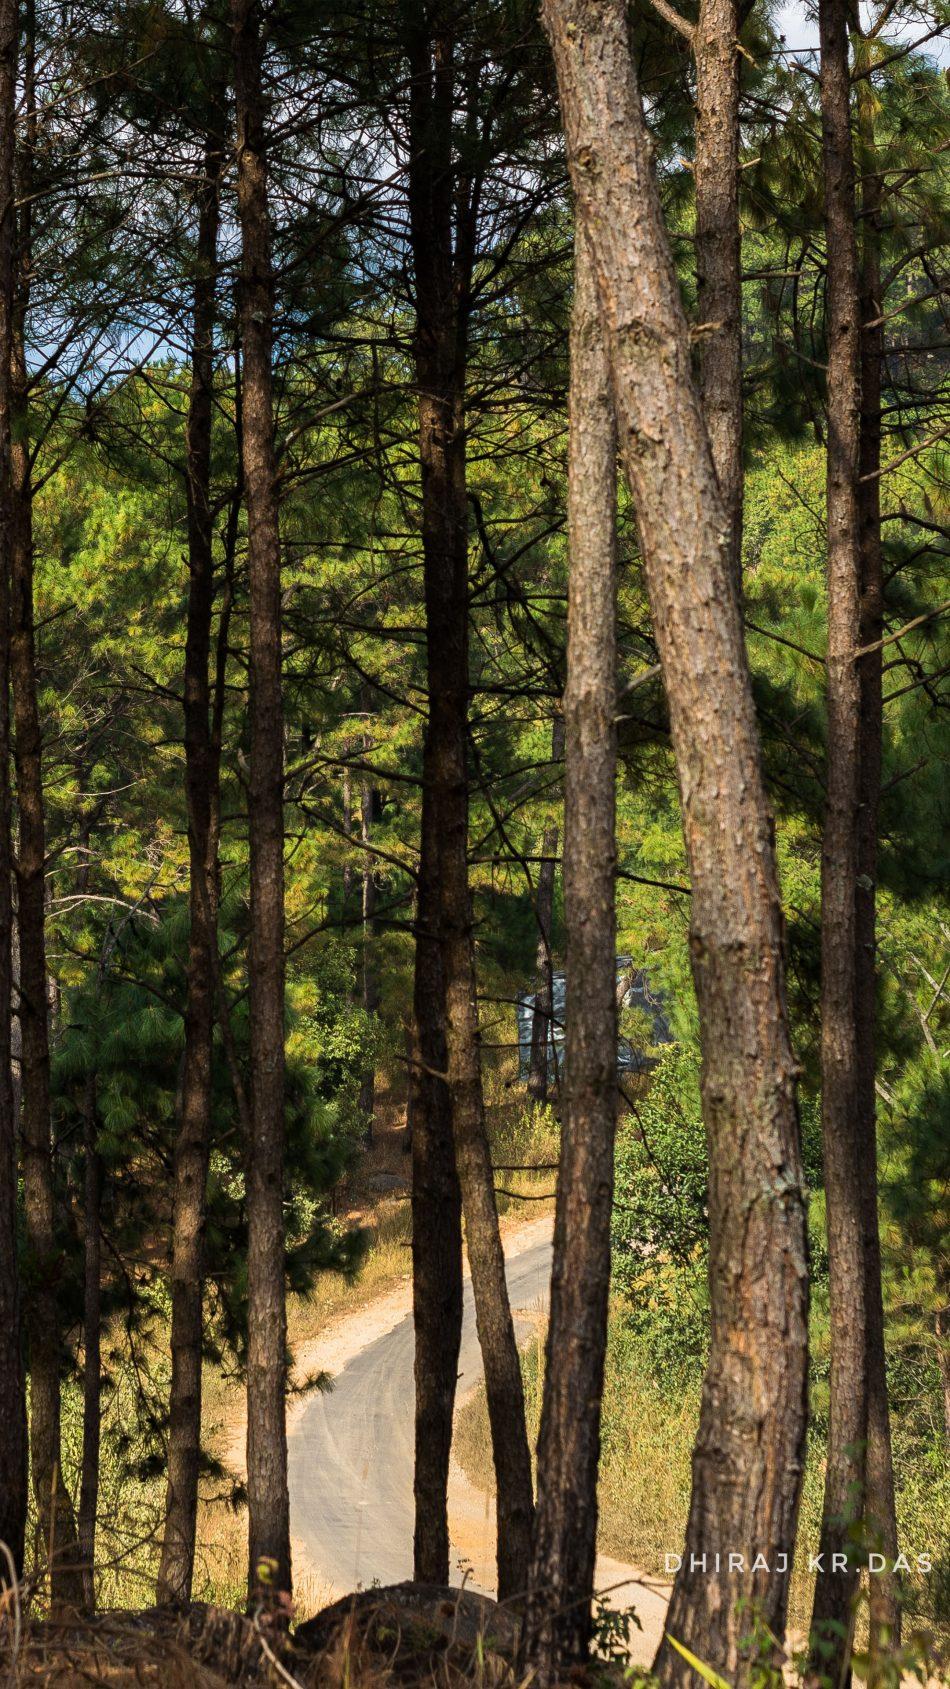 Trees Forest Road Meghalaya 4k Ultra Hd Mobile Wallpaper - Ultra Hd Forest 4k - HD Wallpaper